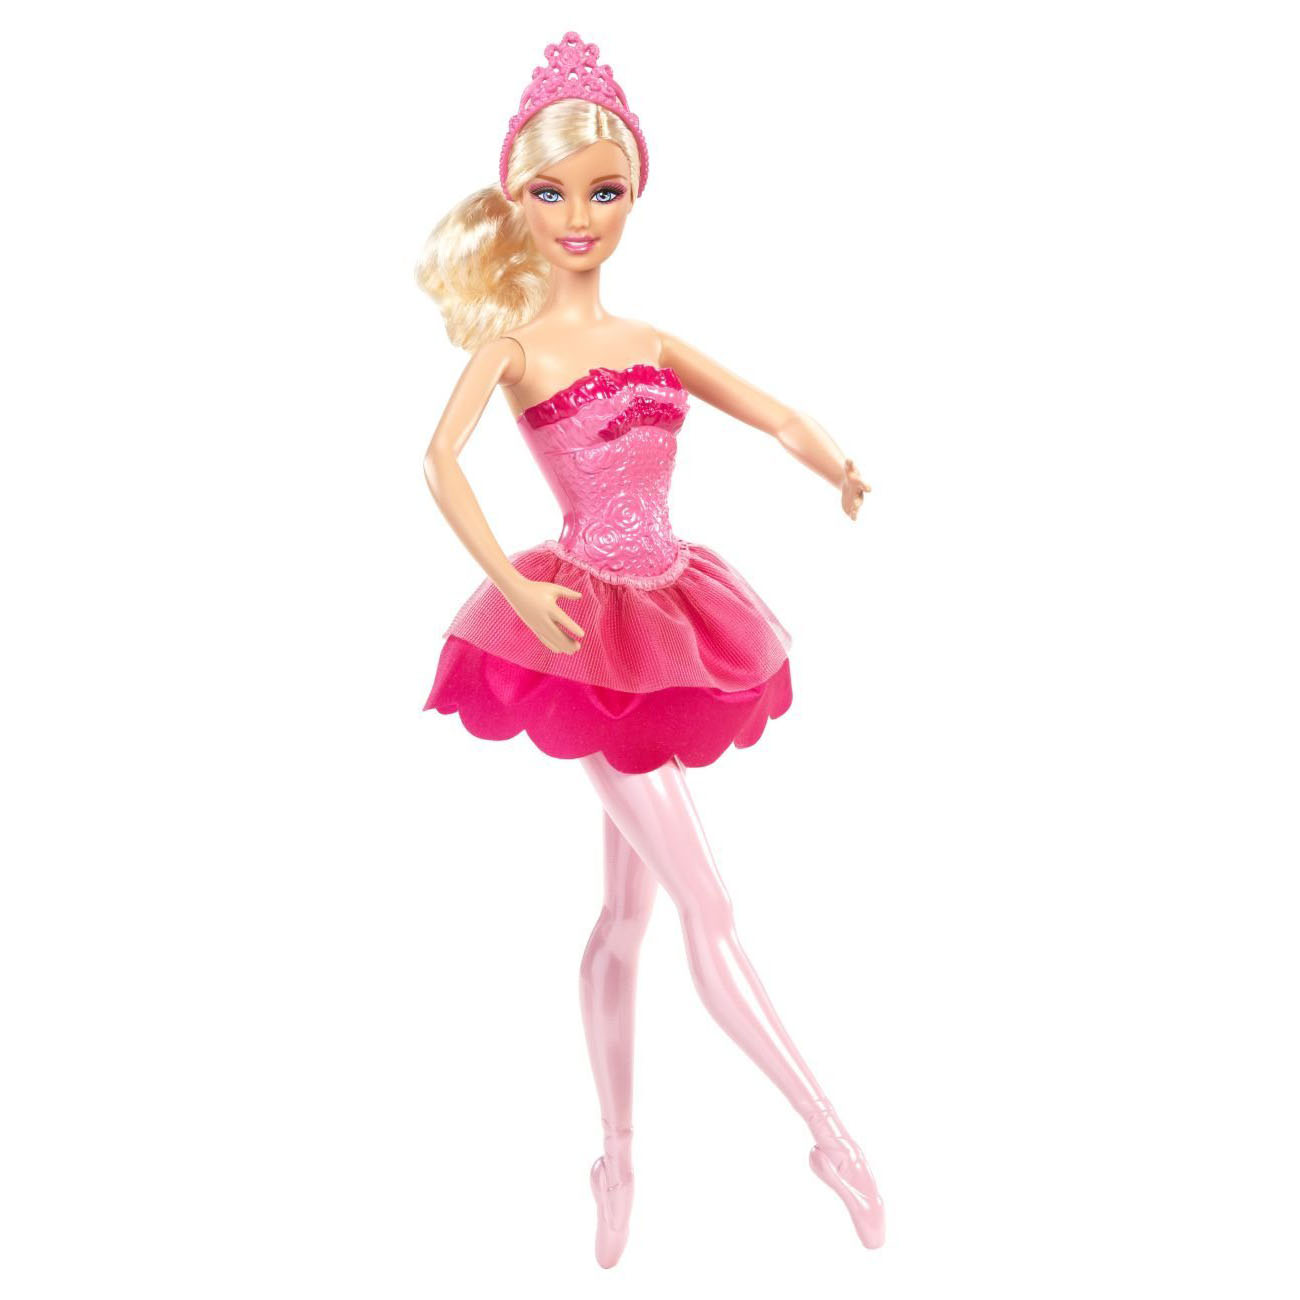 Barbie toys in pink shoes ballerina kristen farraday at - Barbie ballerine ...